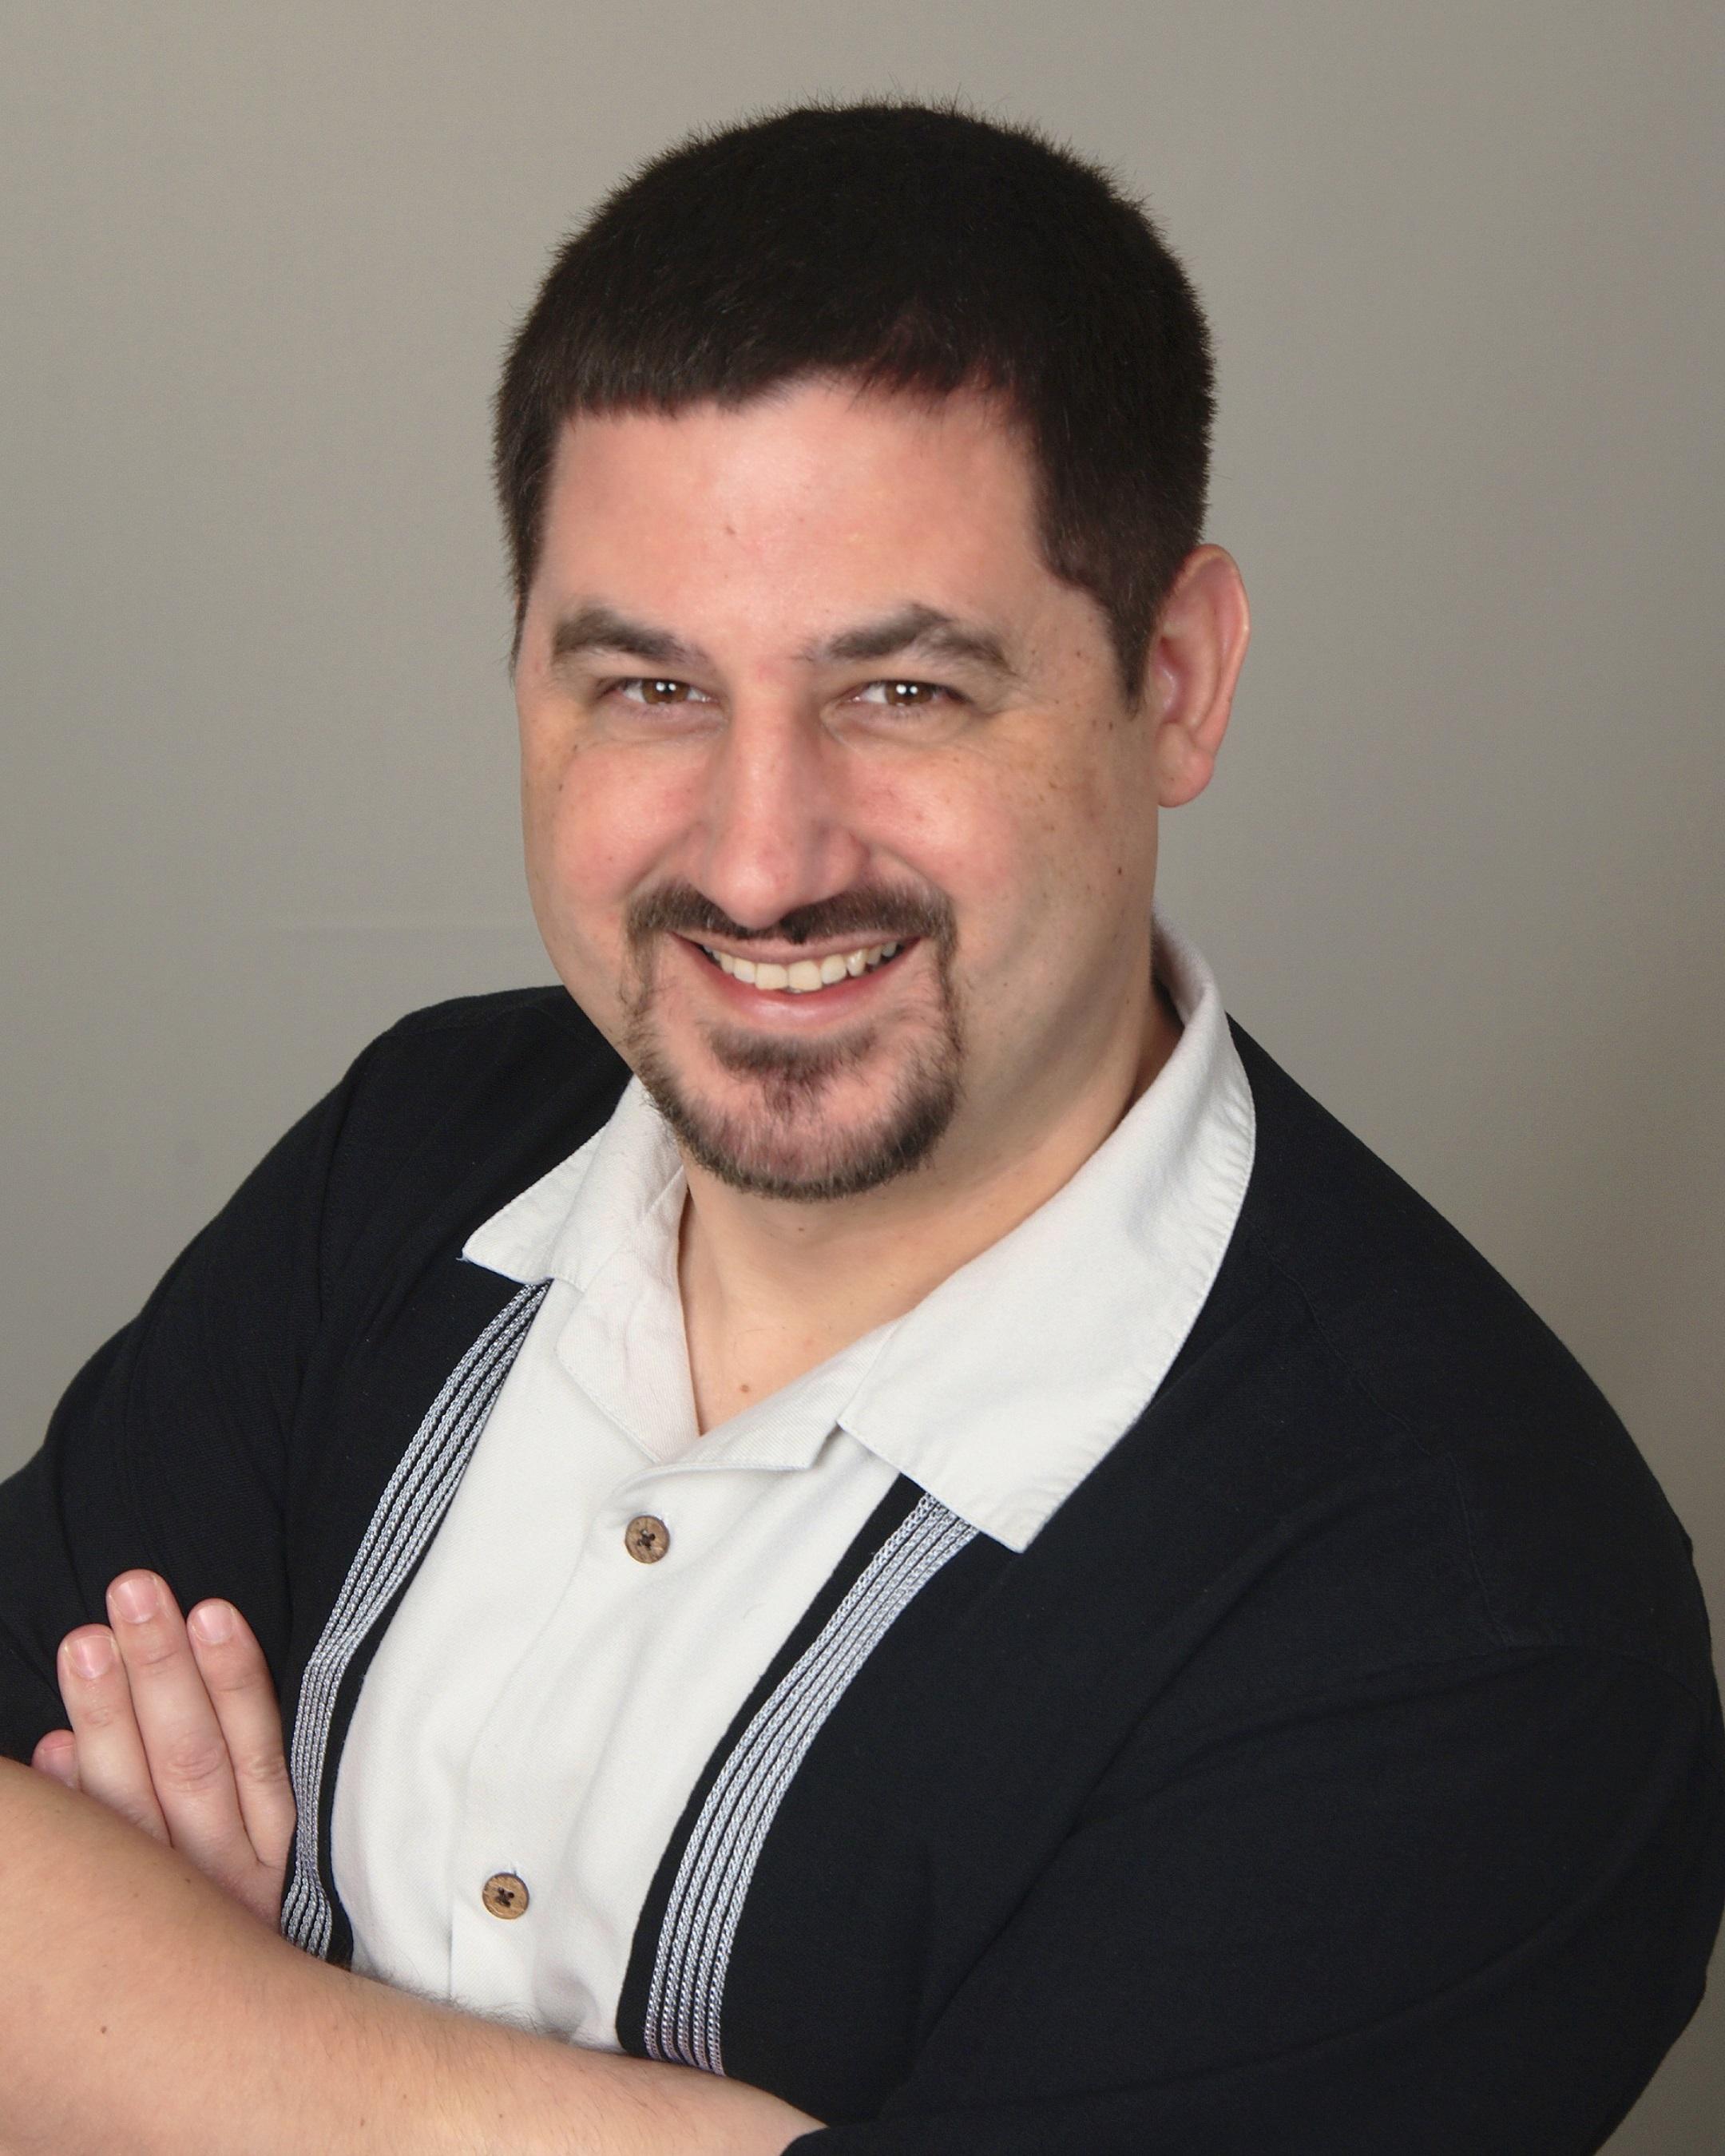 Jeremy Honsowetz, Licensed Professional Counselor